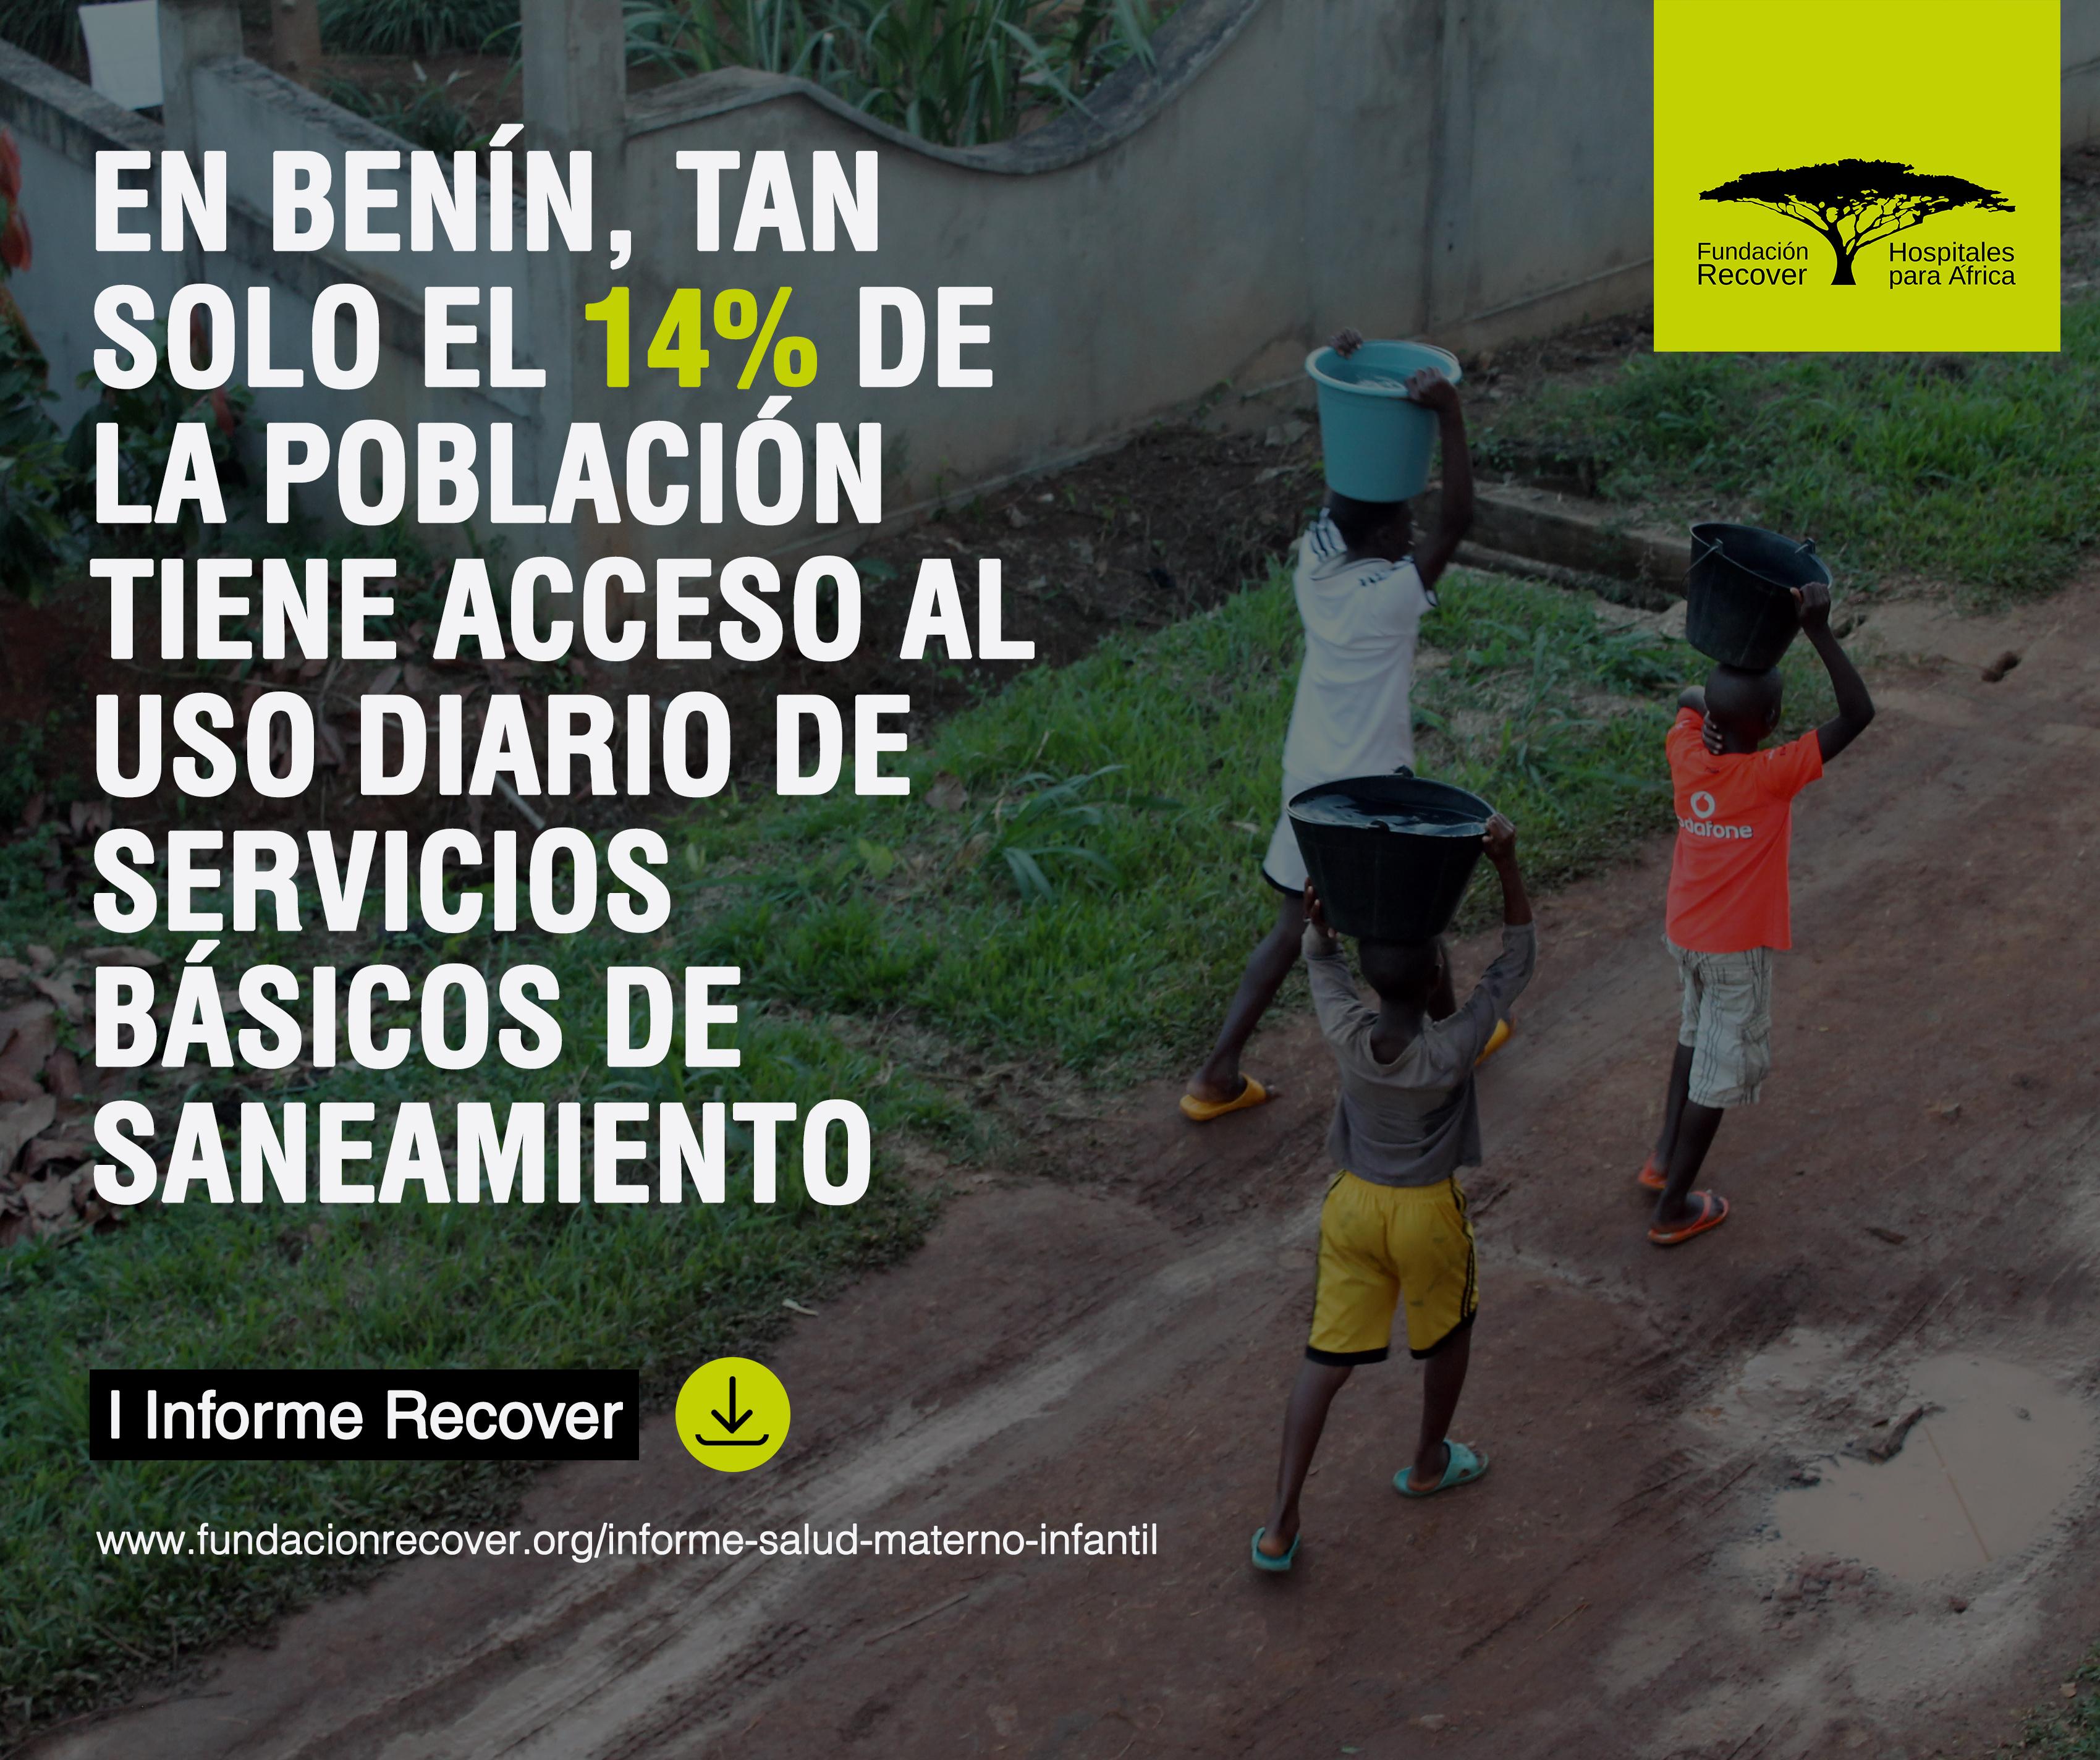 Frases Informe Recover Agua Y Saneamiento Facebook